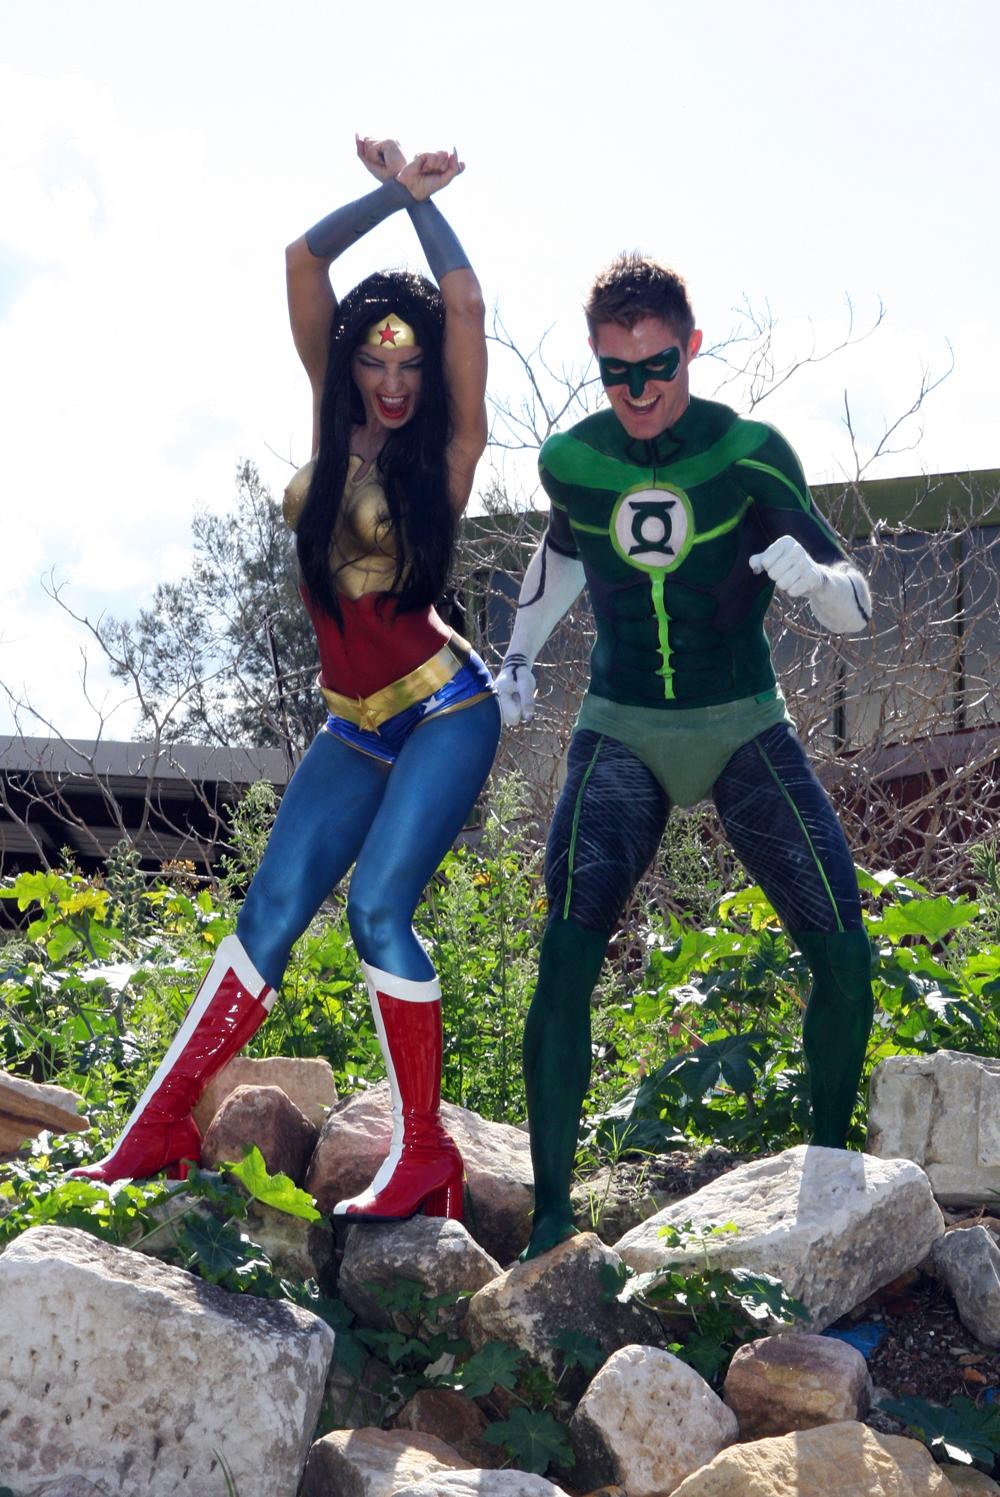 File:Wonder Woman, Green Lantern (8637212488).jpg ... Eva Green